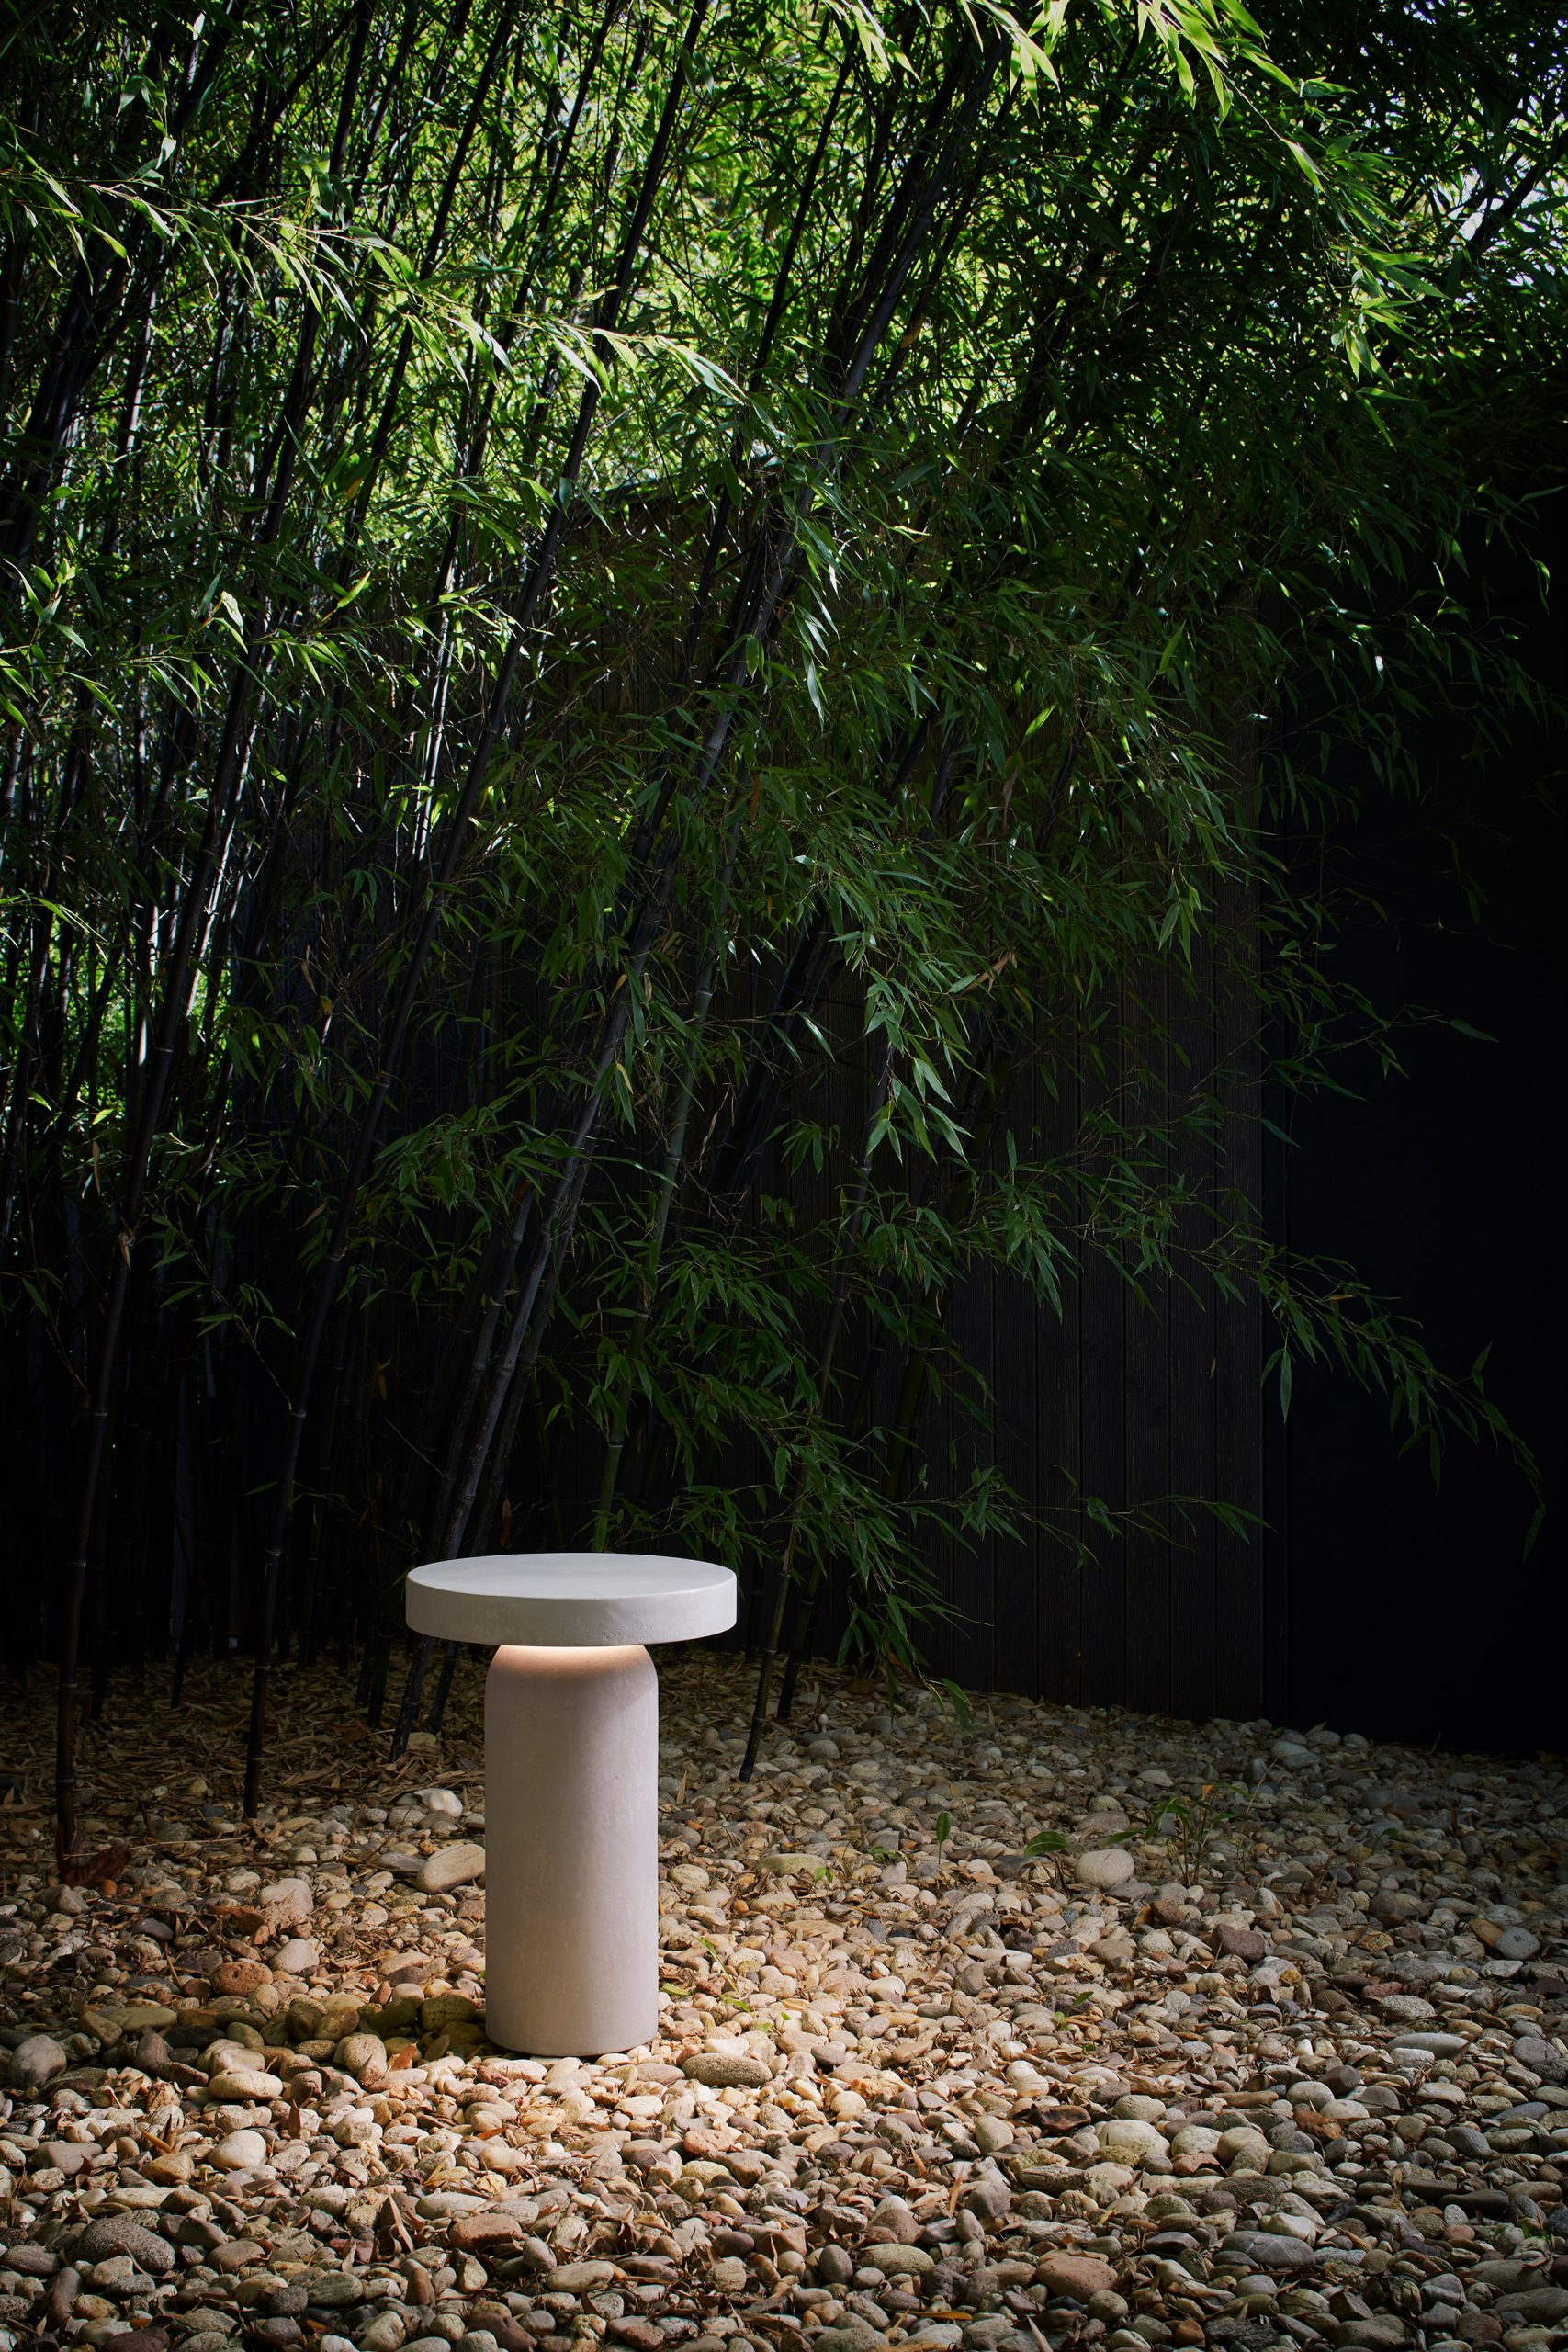 Nui bollard outdoor light by Meneghello Paolelli Associati